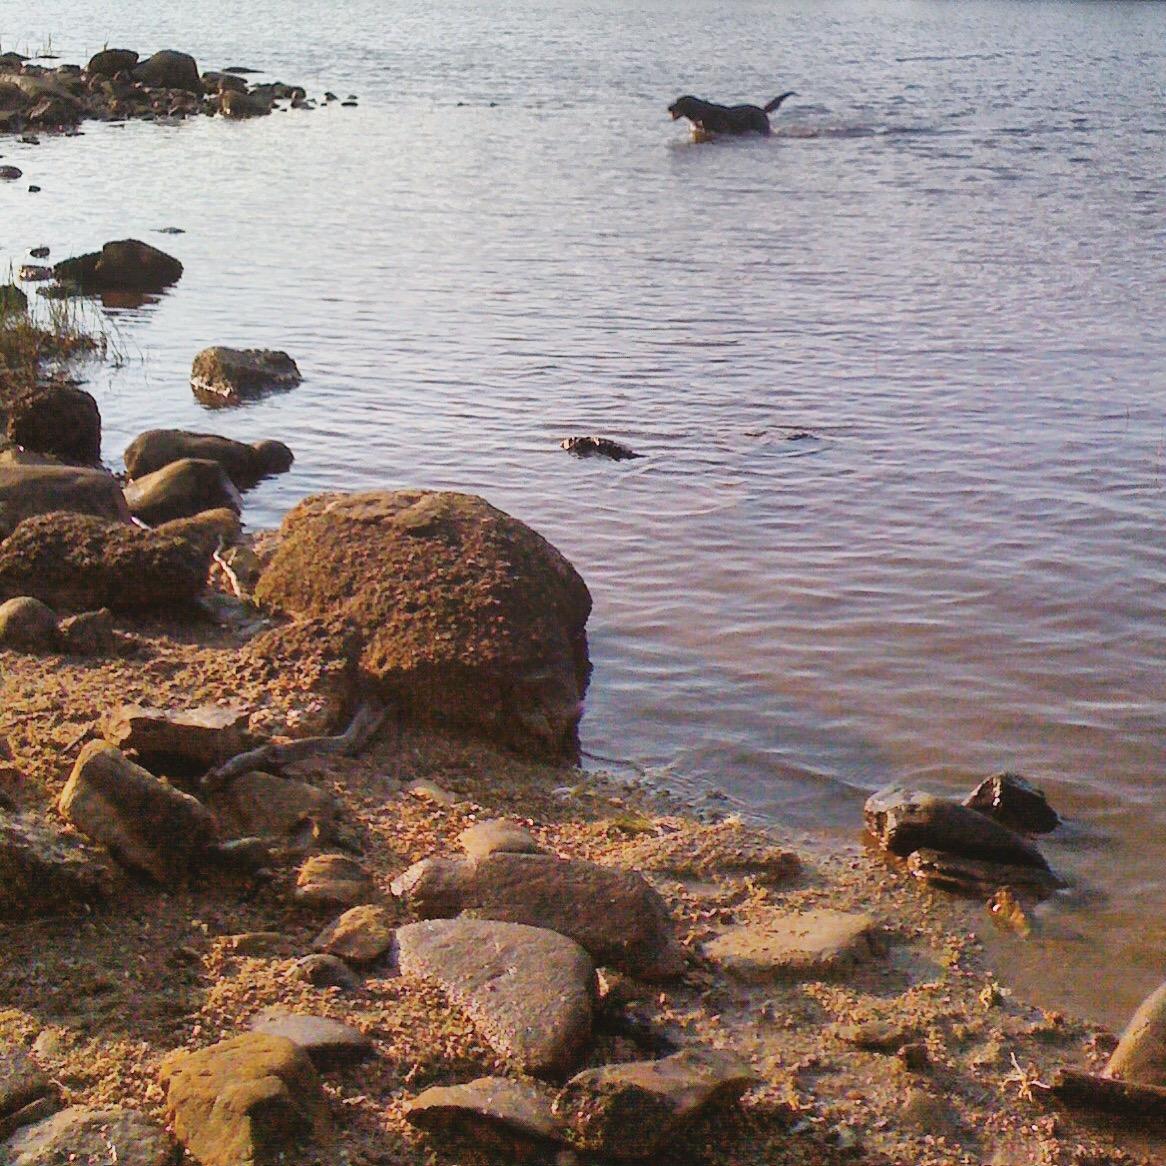 Long Lake off-leash dog-friendly